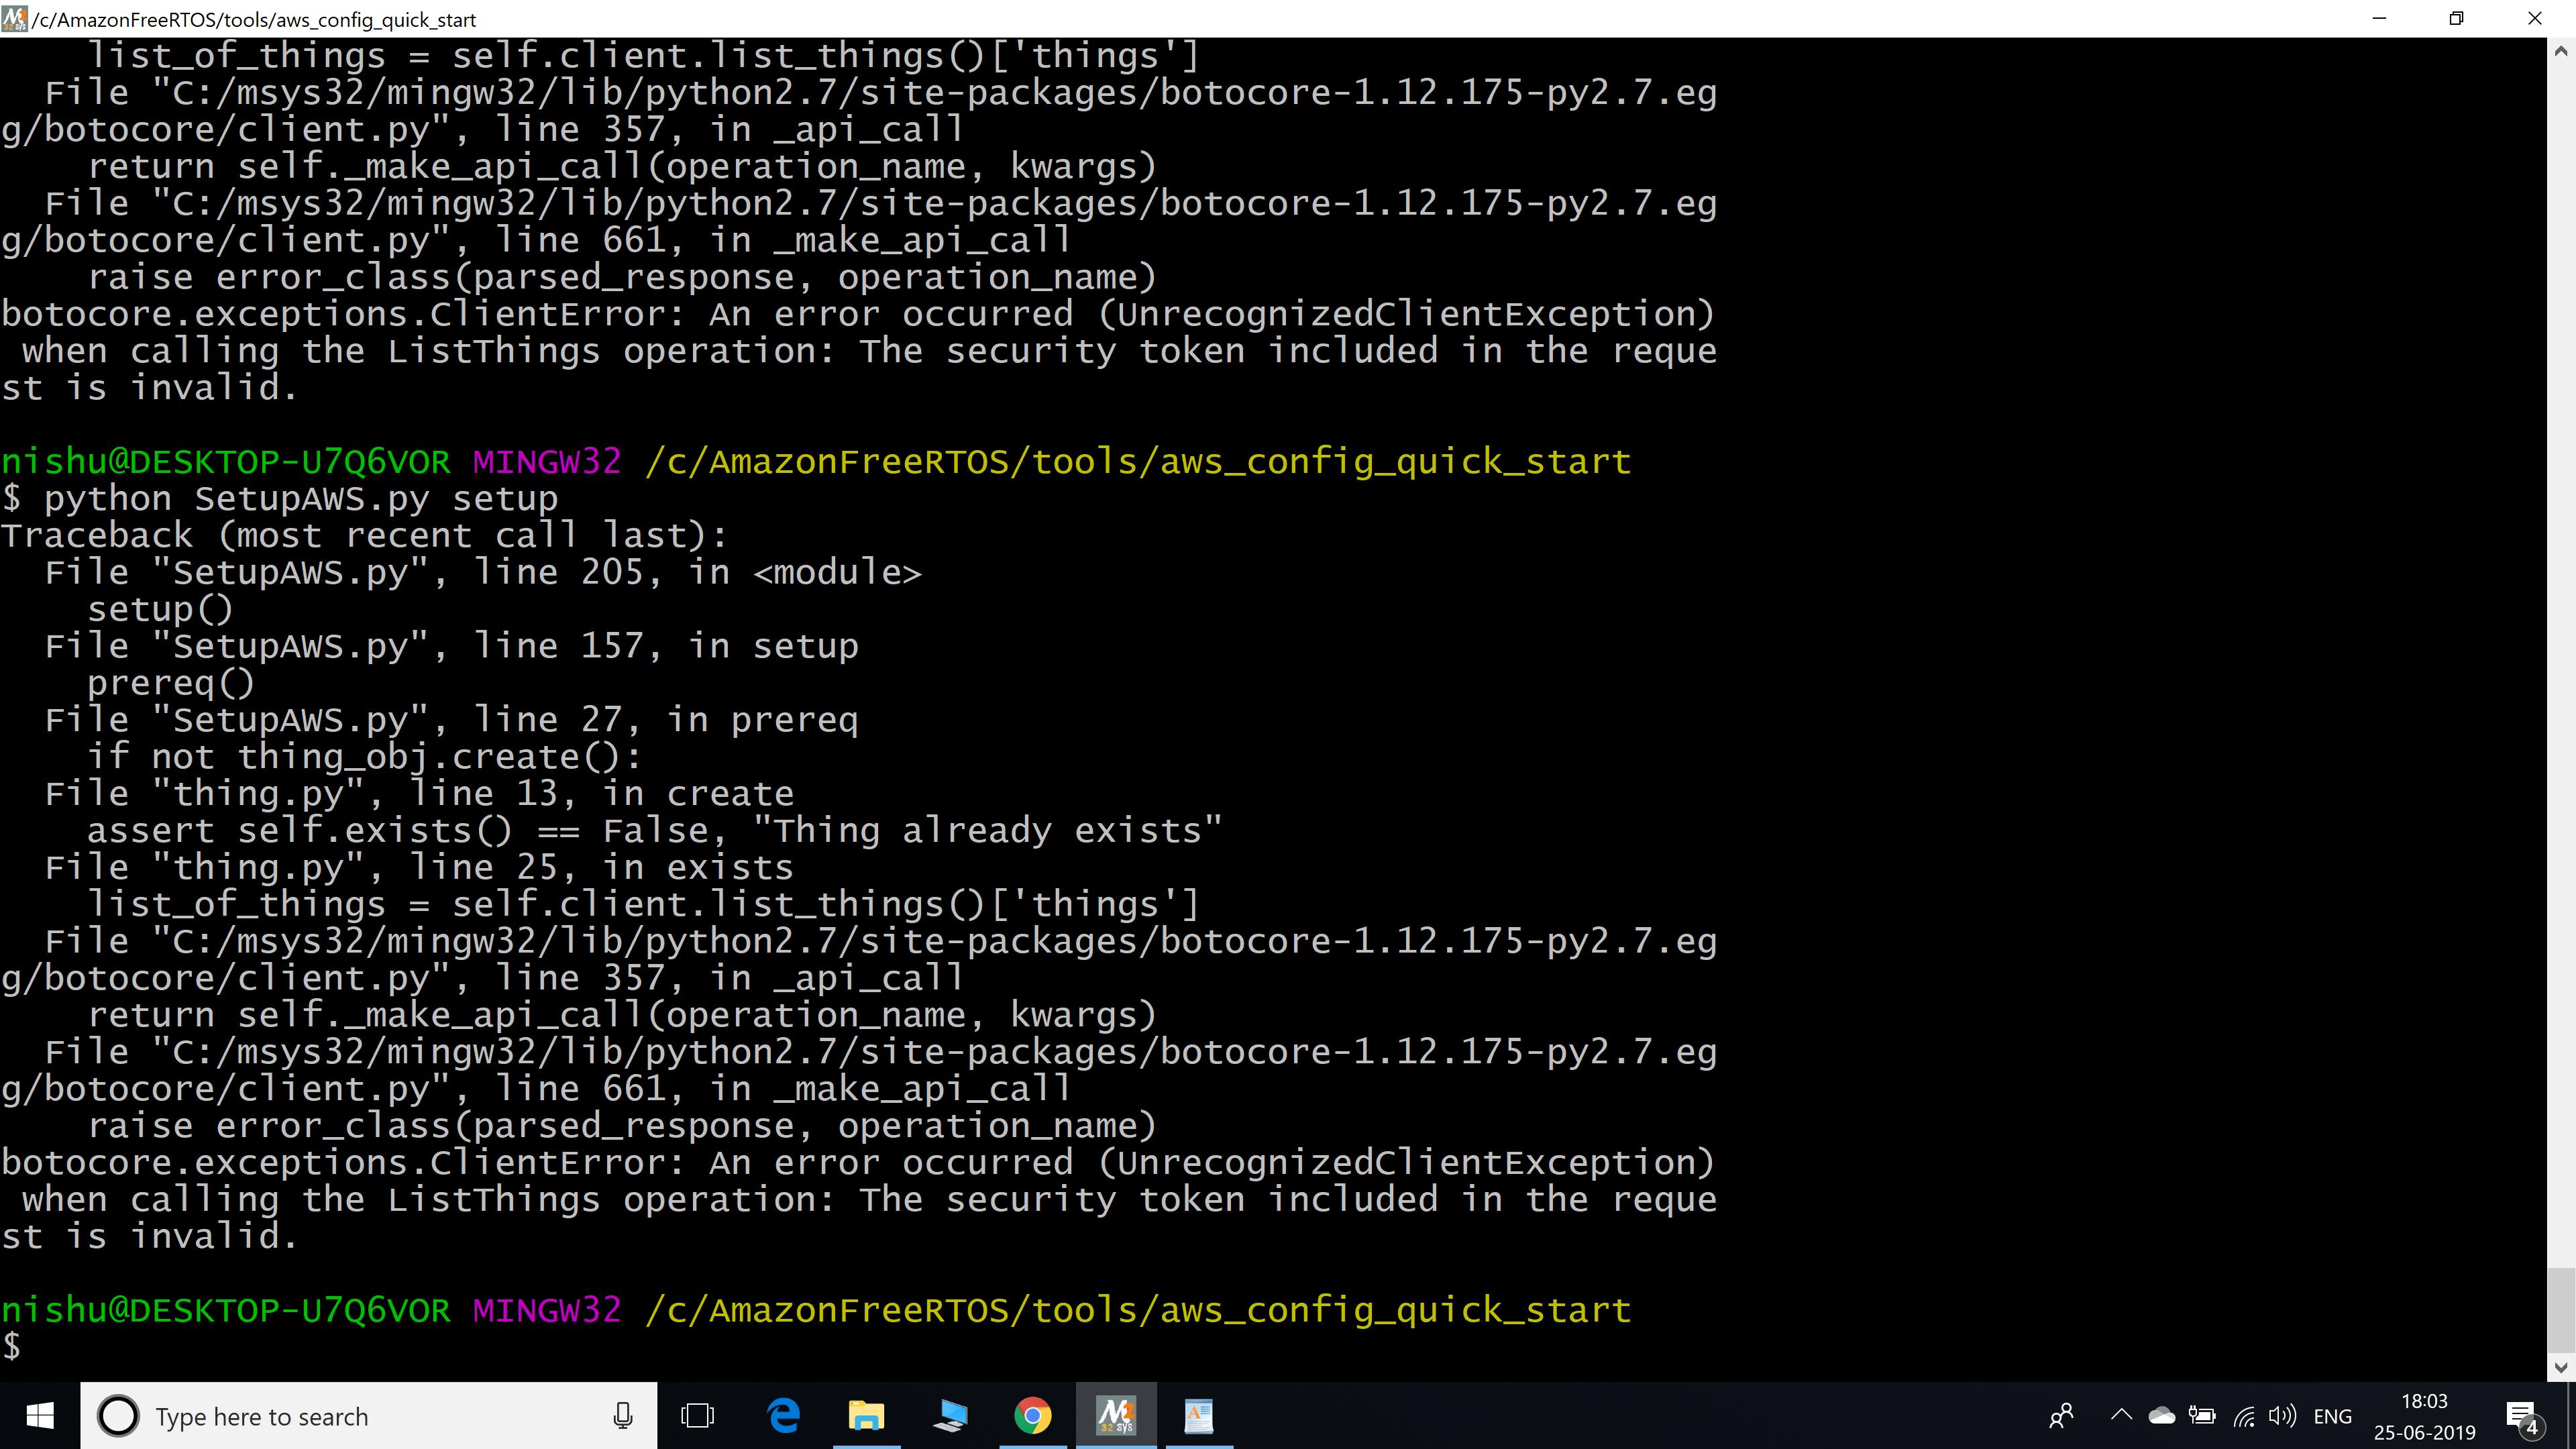 Error while running 'python SetupAWS py setup' · Issue #841 · aws